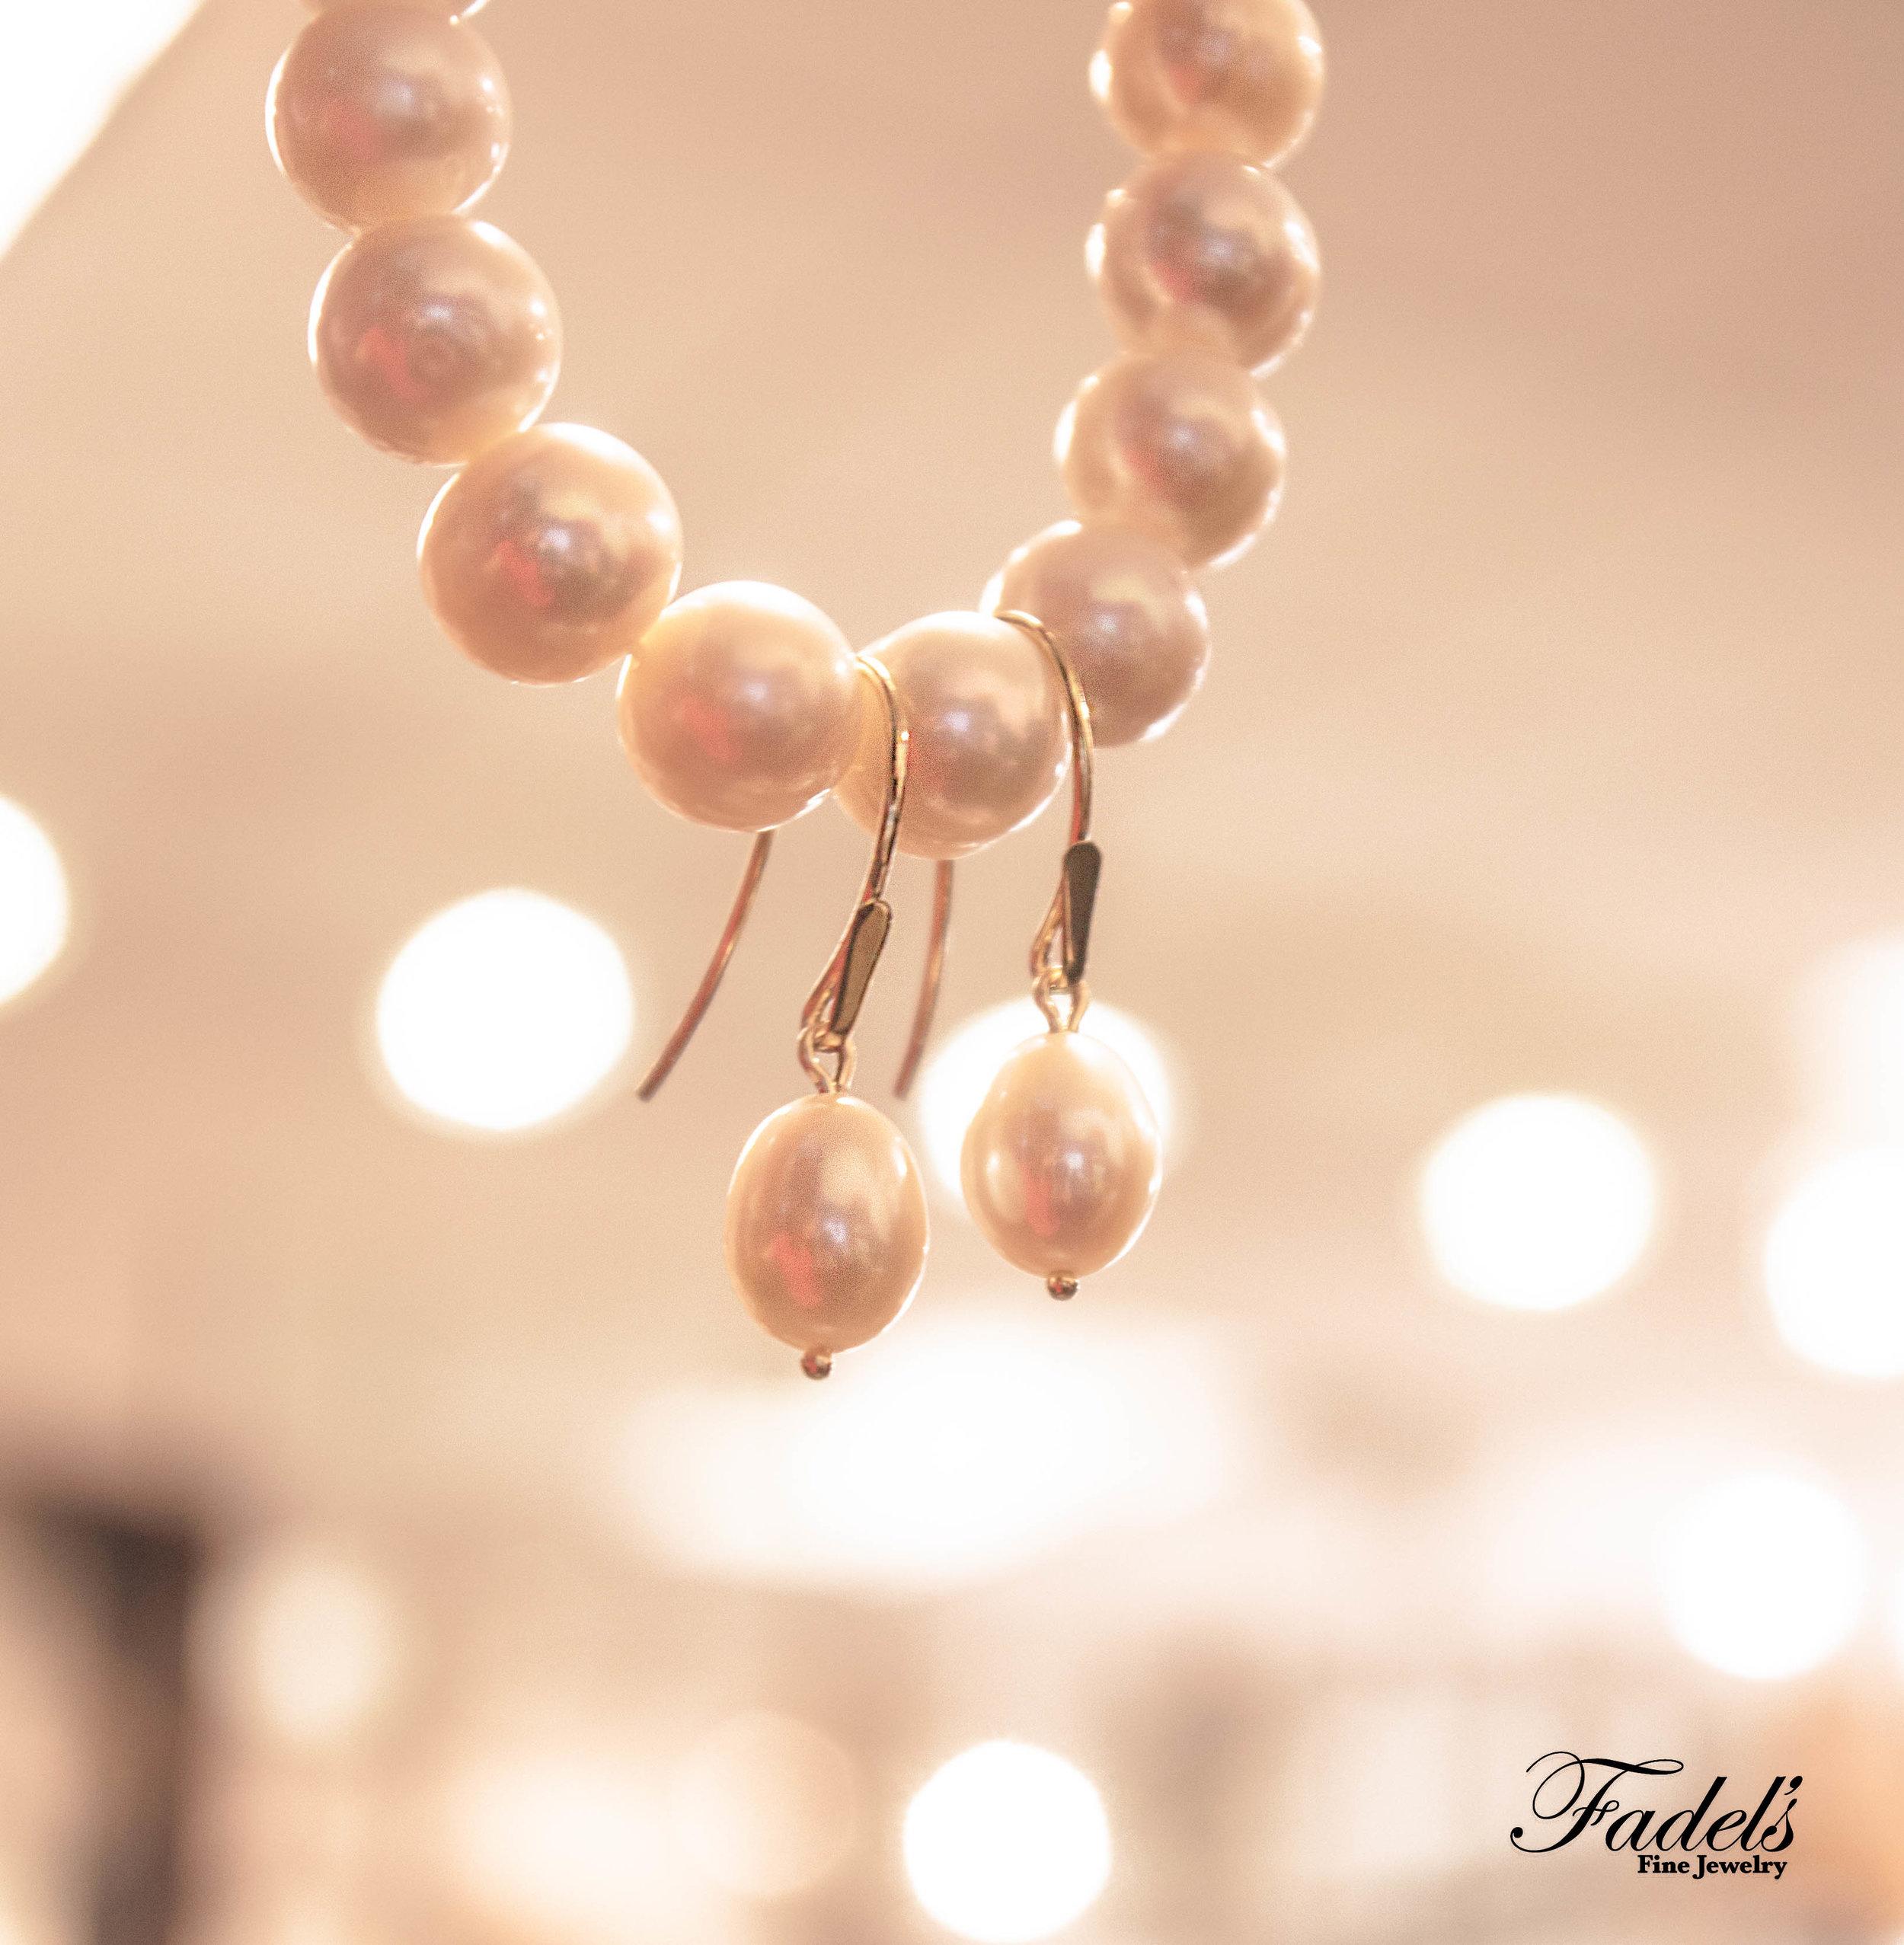 Pearl dangling earrings on pearl bracelet.JPG